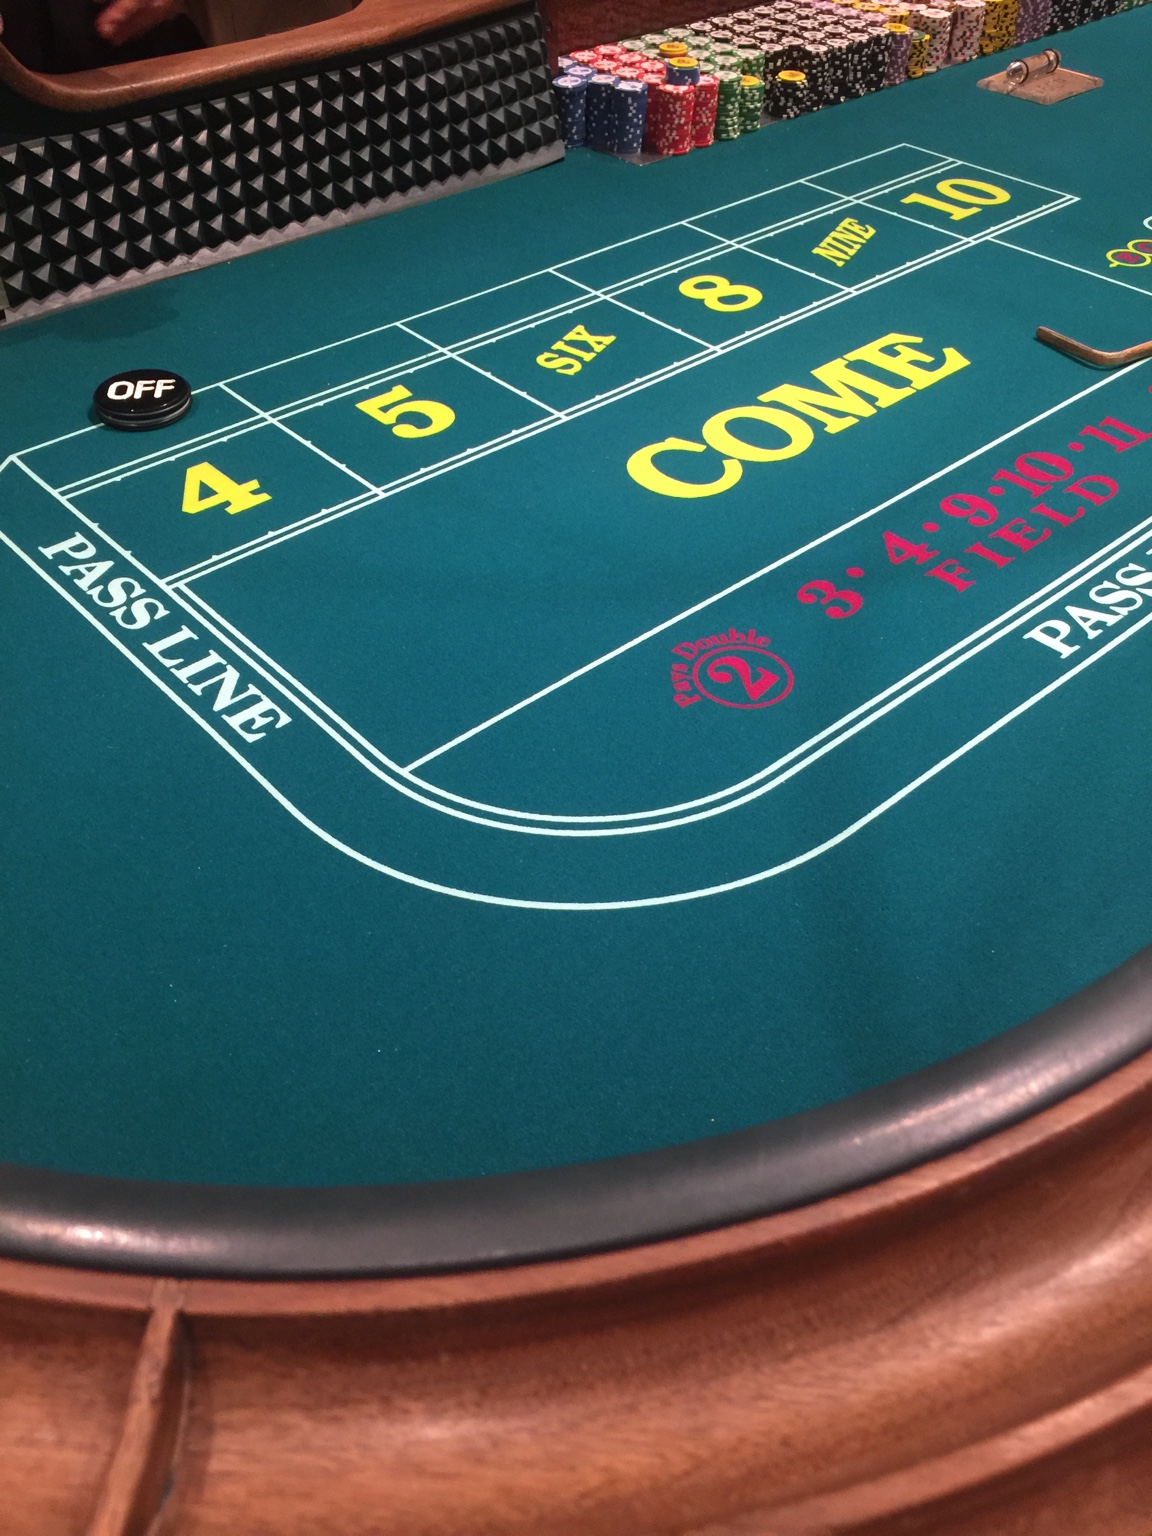 Craps betting explained